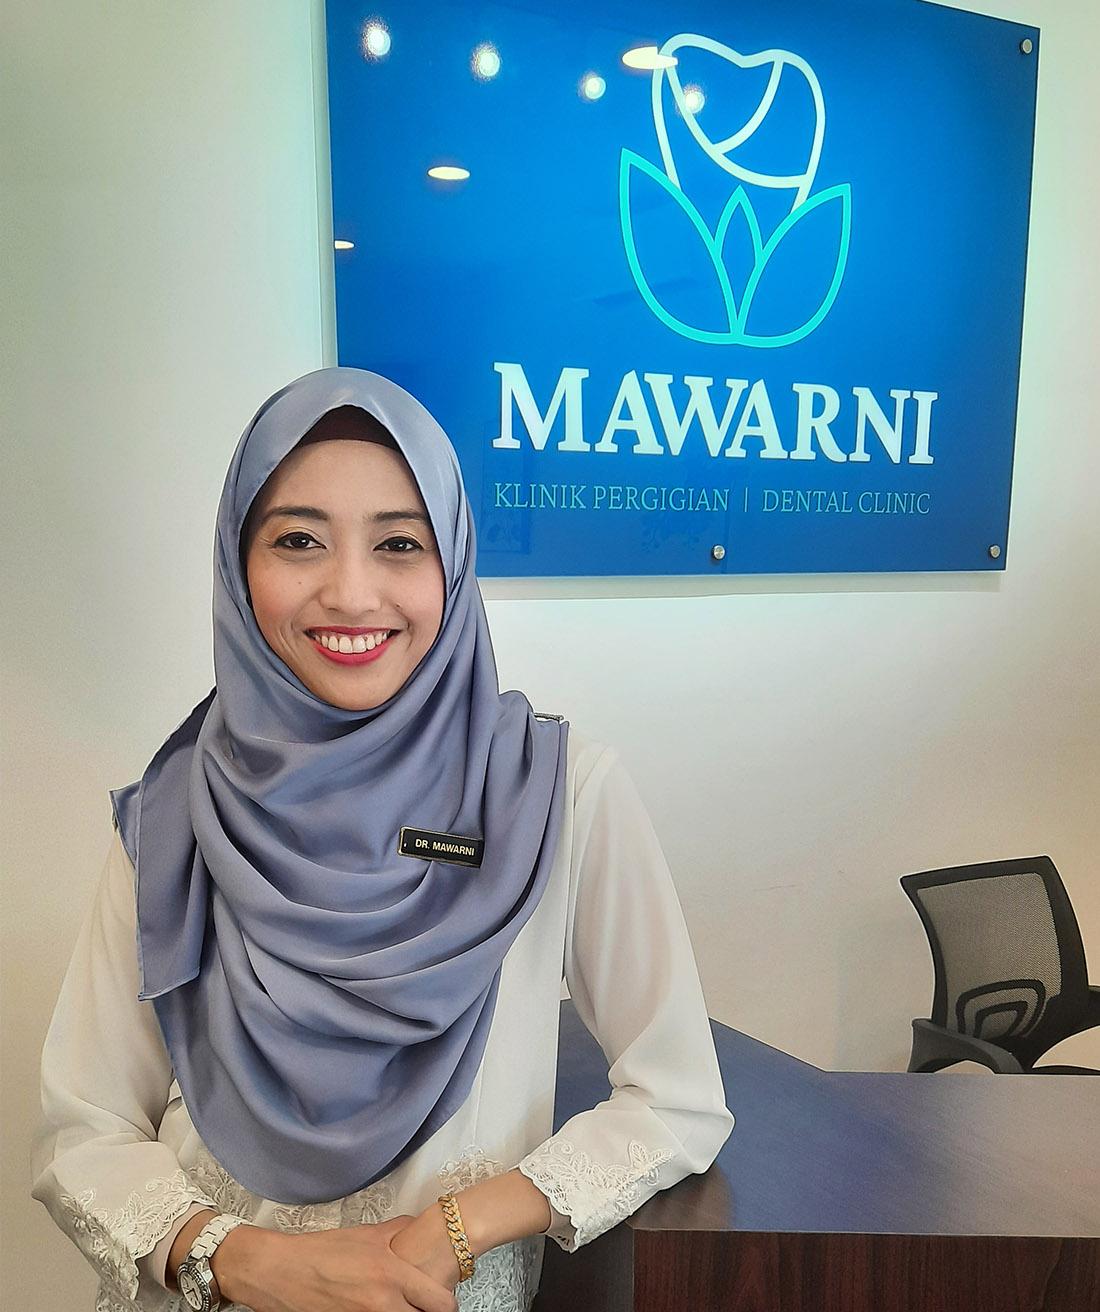 Dr Mawarni